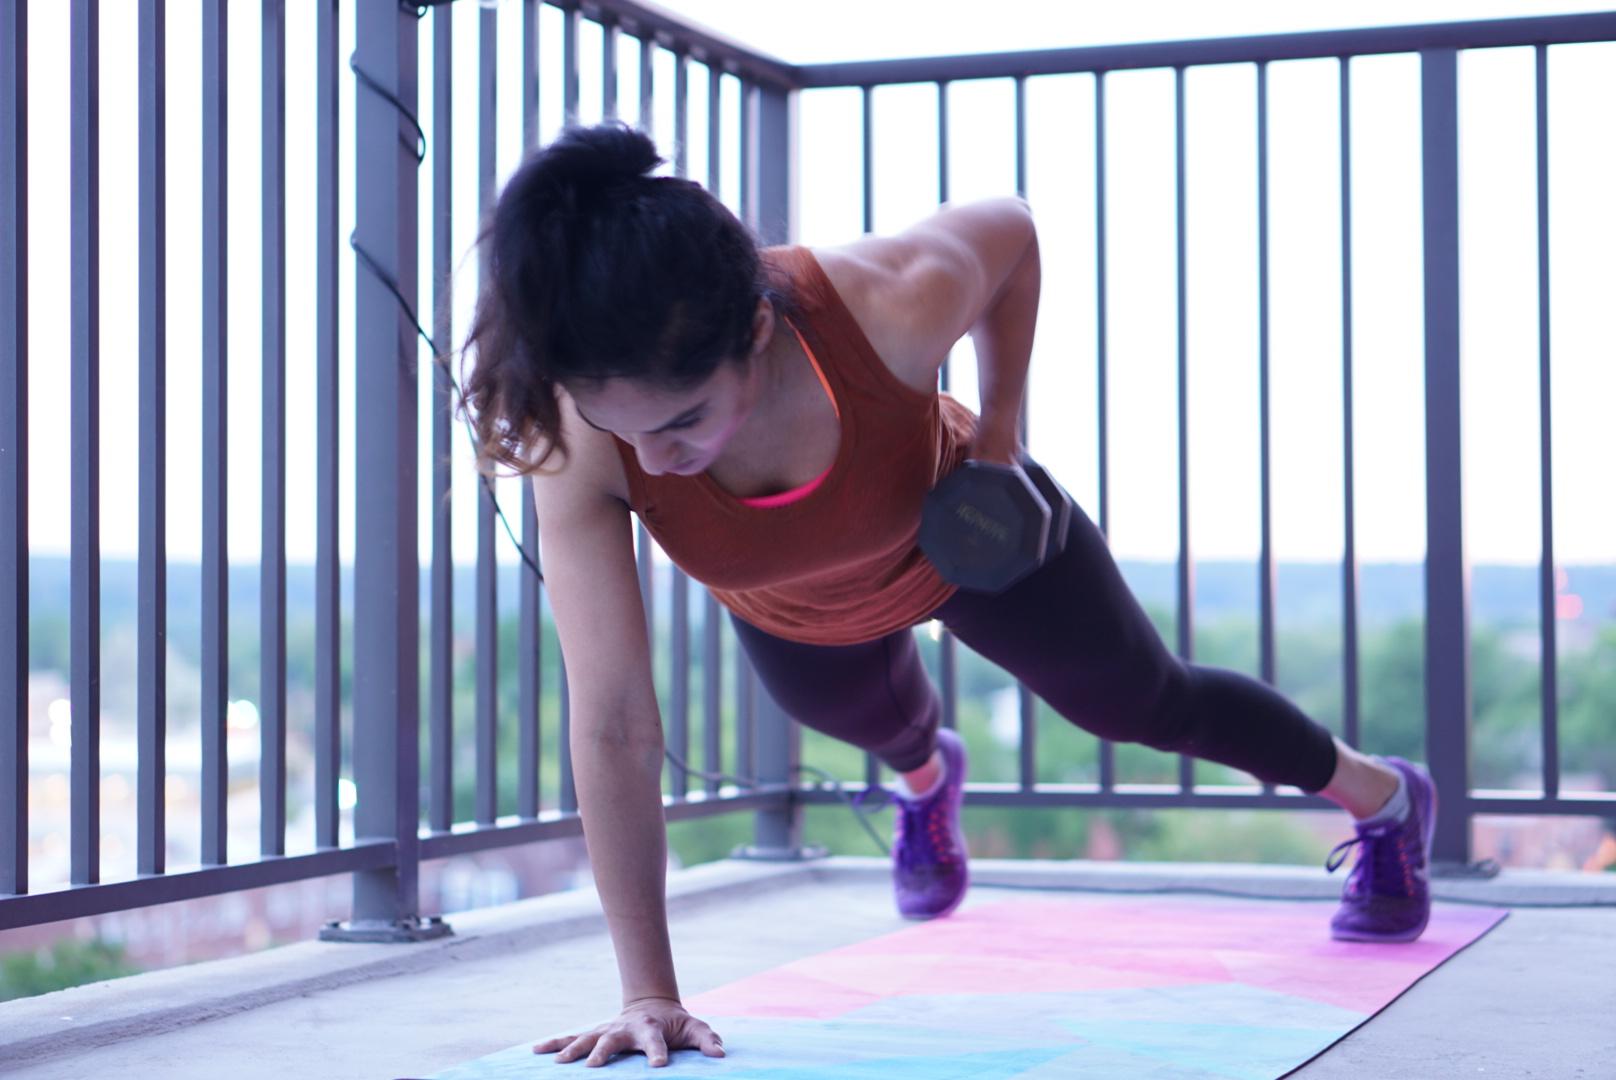 Get Your Fitness Goals Back on Track -